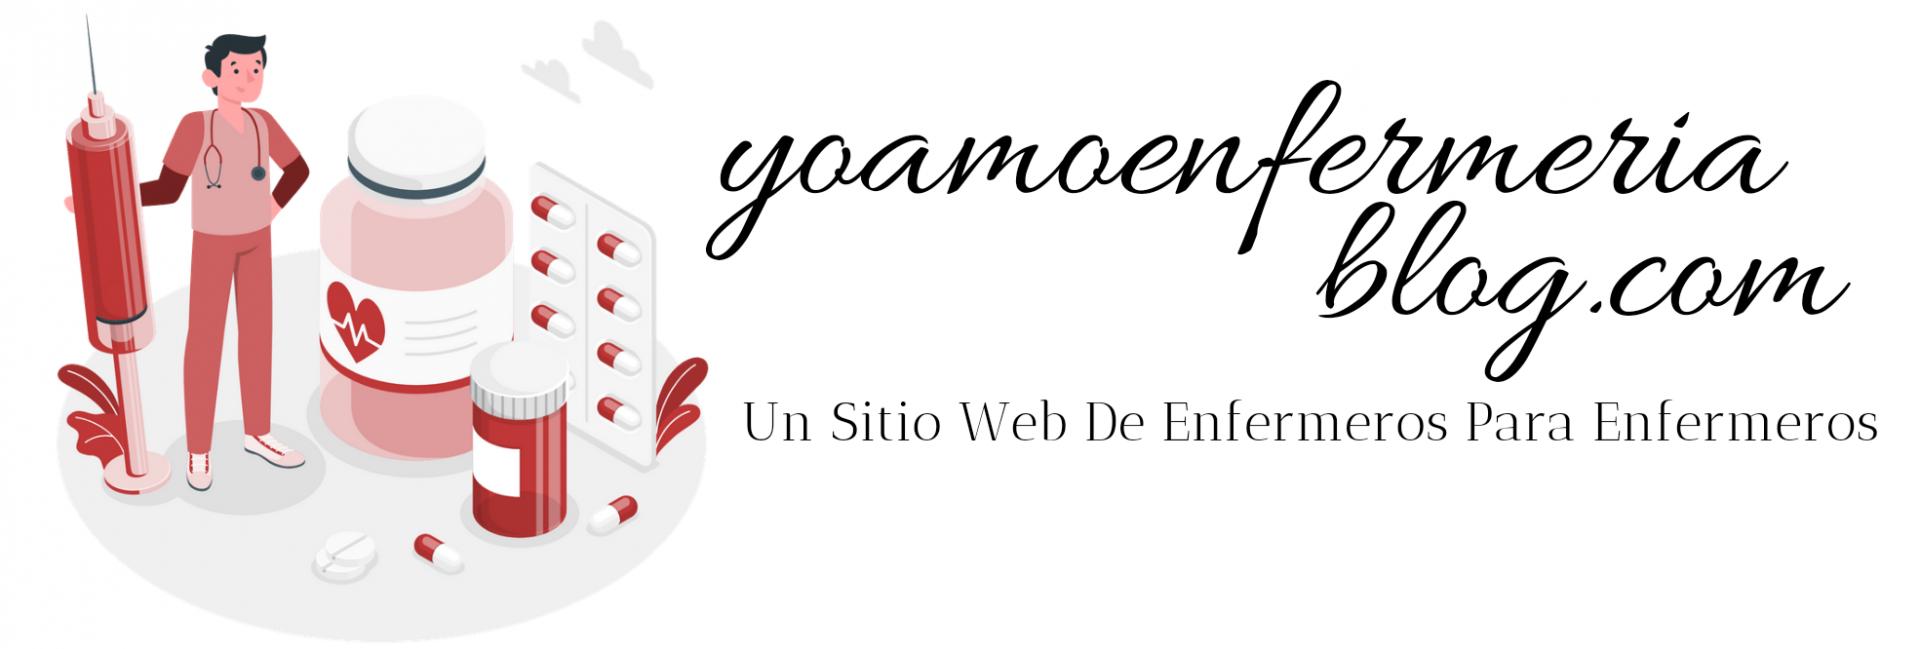 yoamoenfermeria.com